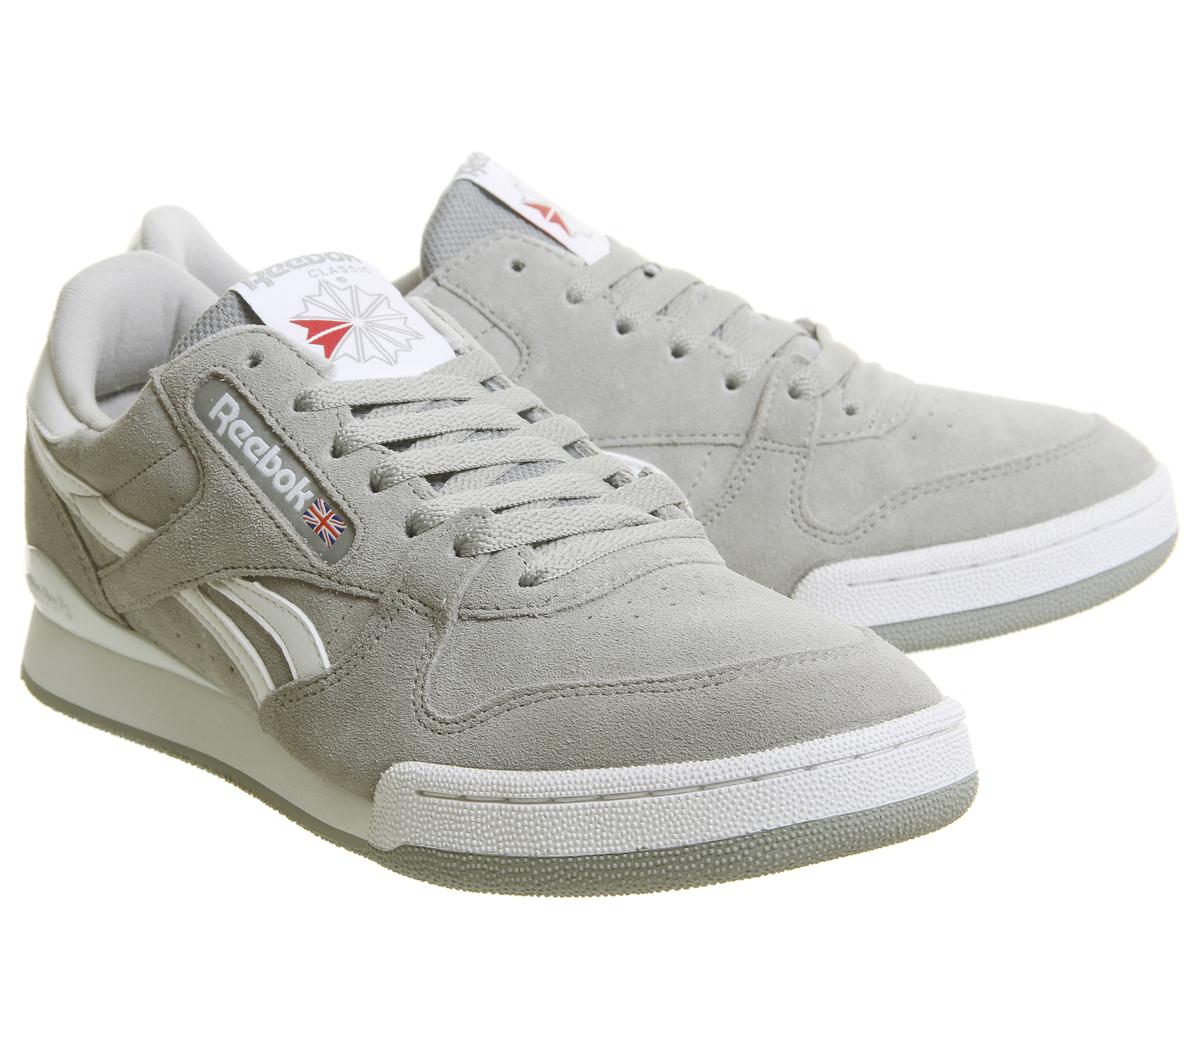 Reebok Shoes Tin 1 Phase White Ebay Trainers Grey Pro HwHFrC1q